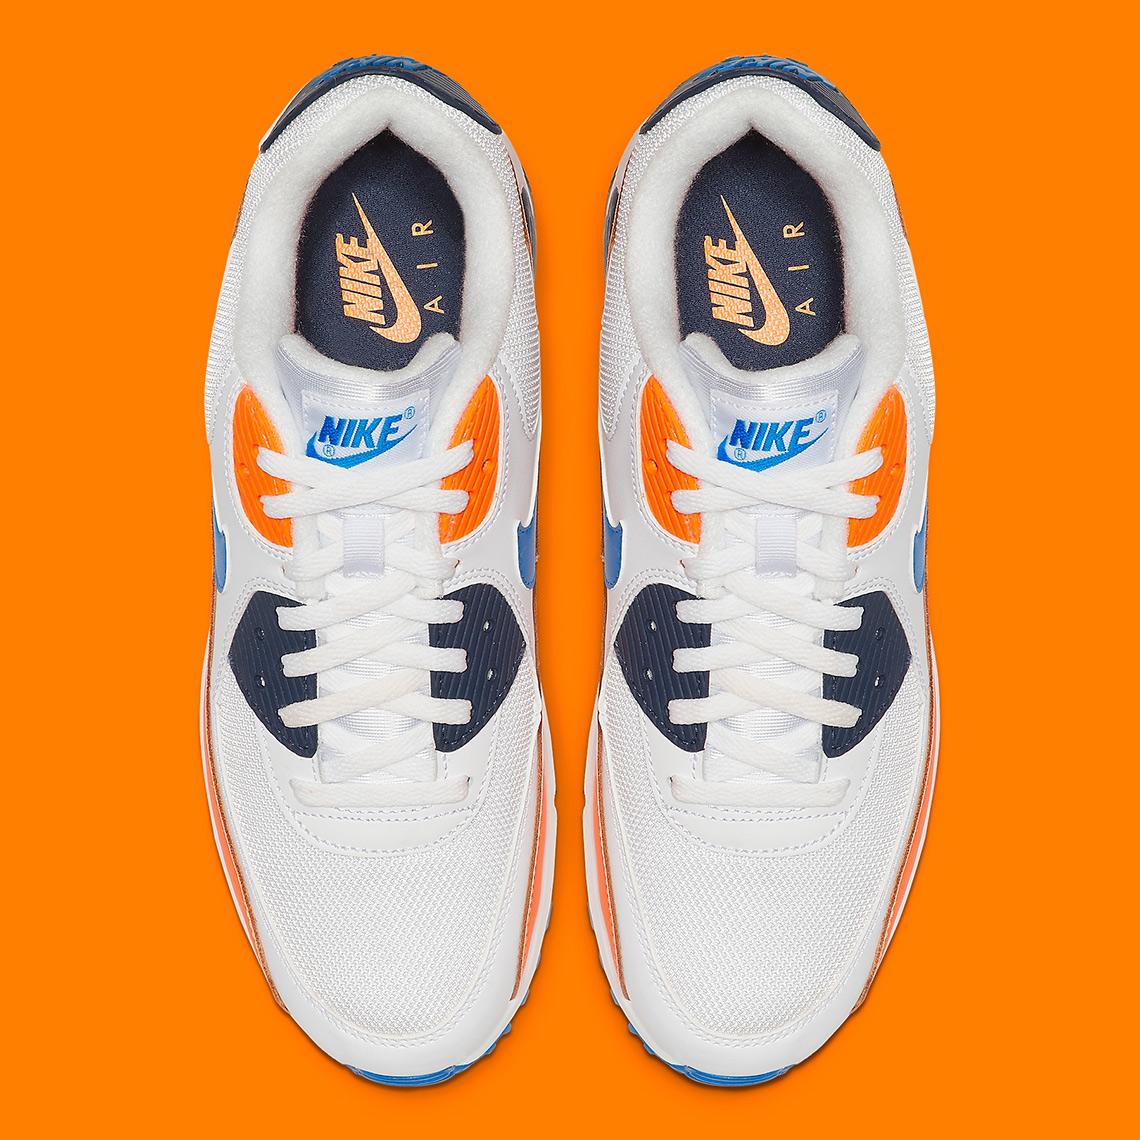 d0ddd9beee Nike Air Max 90 Orange Blue AJ1285-104 | SneakerNews.com